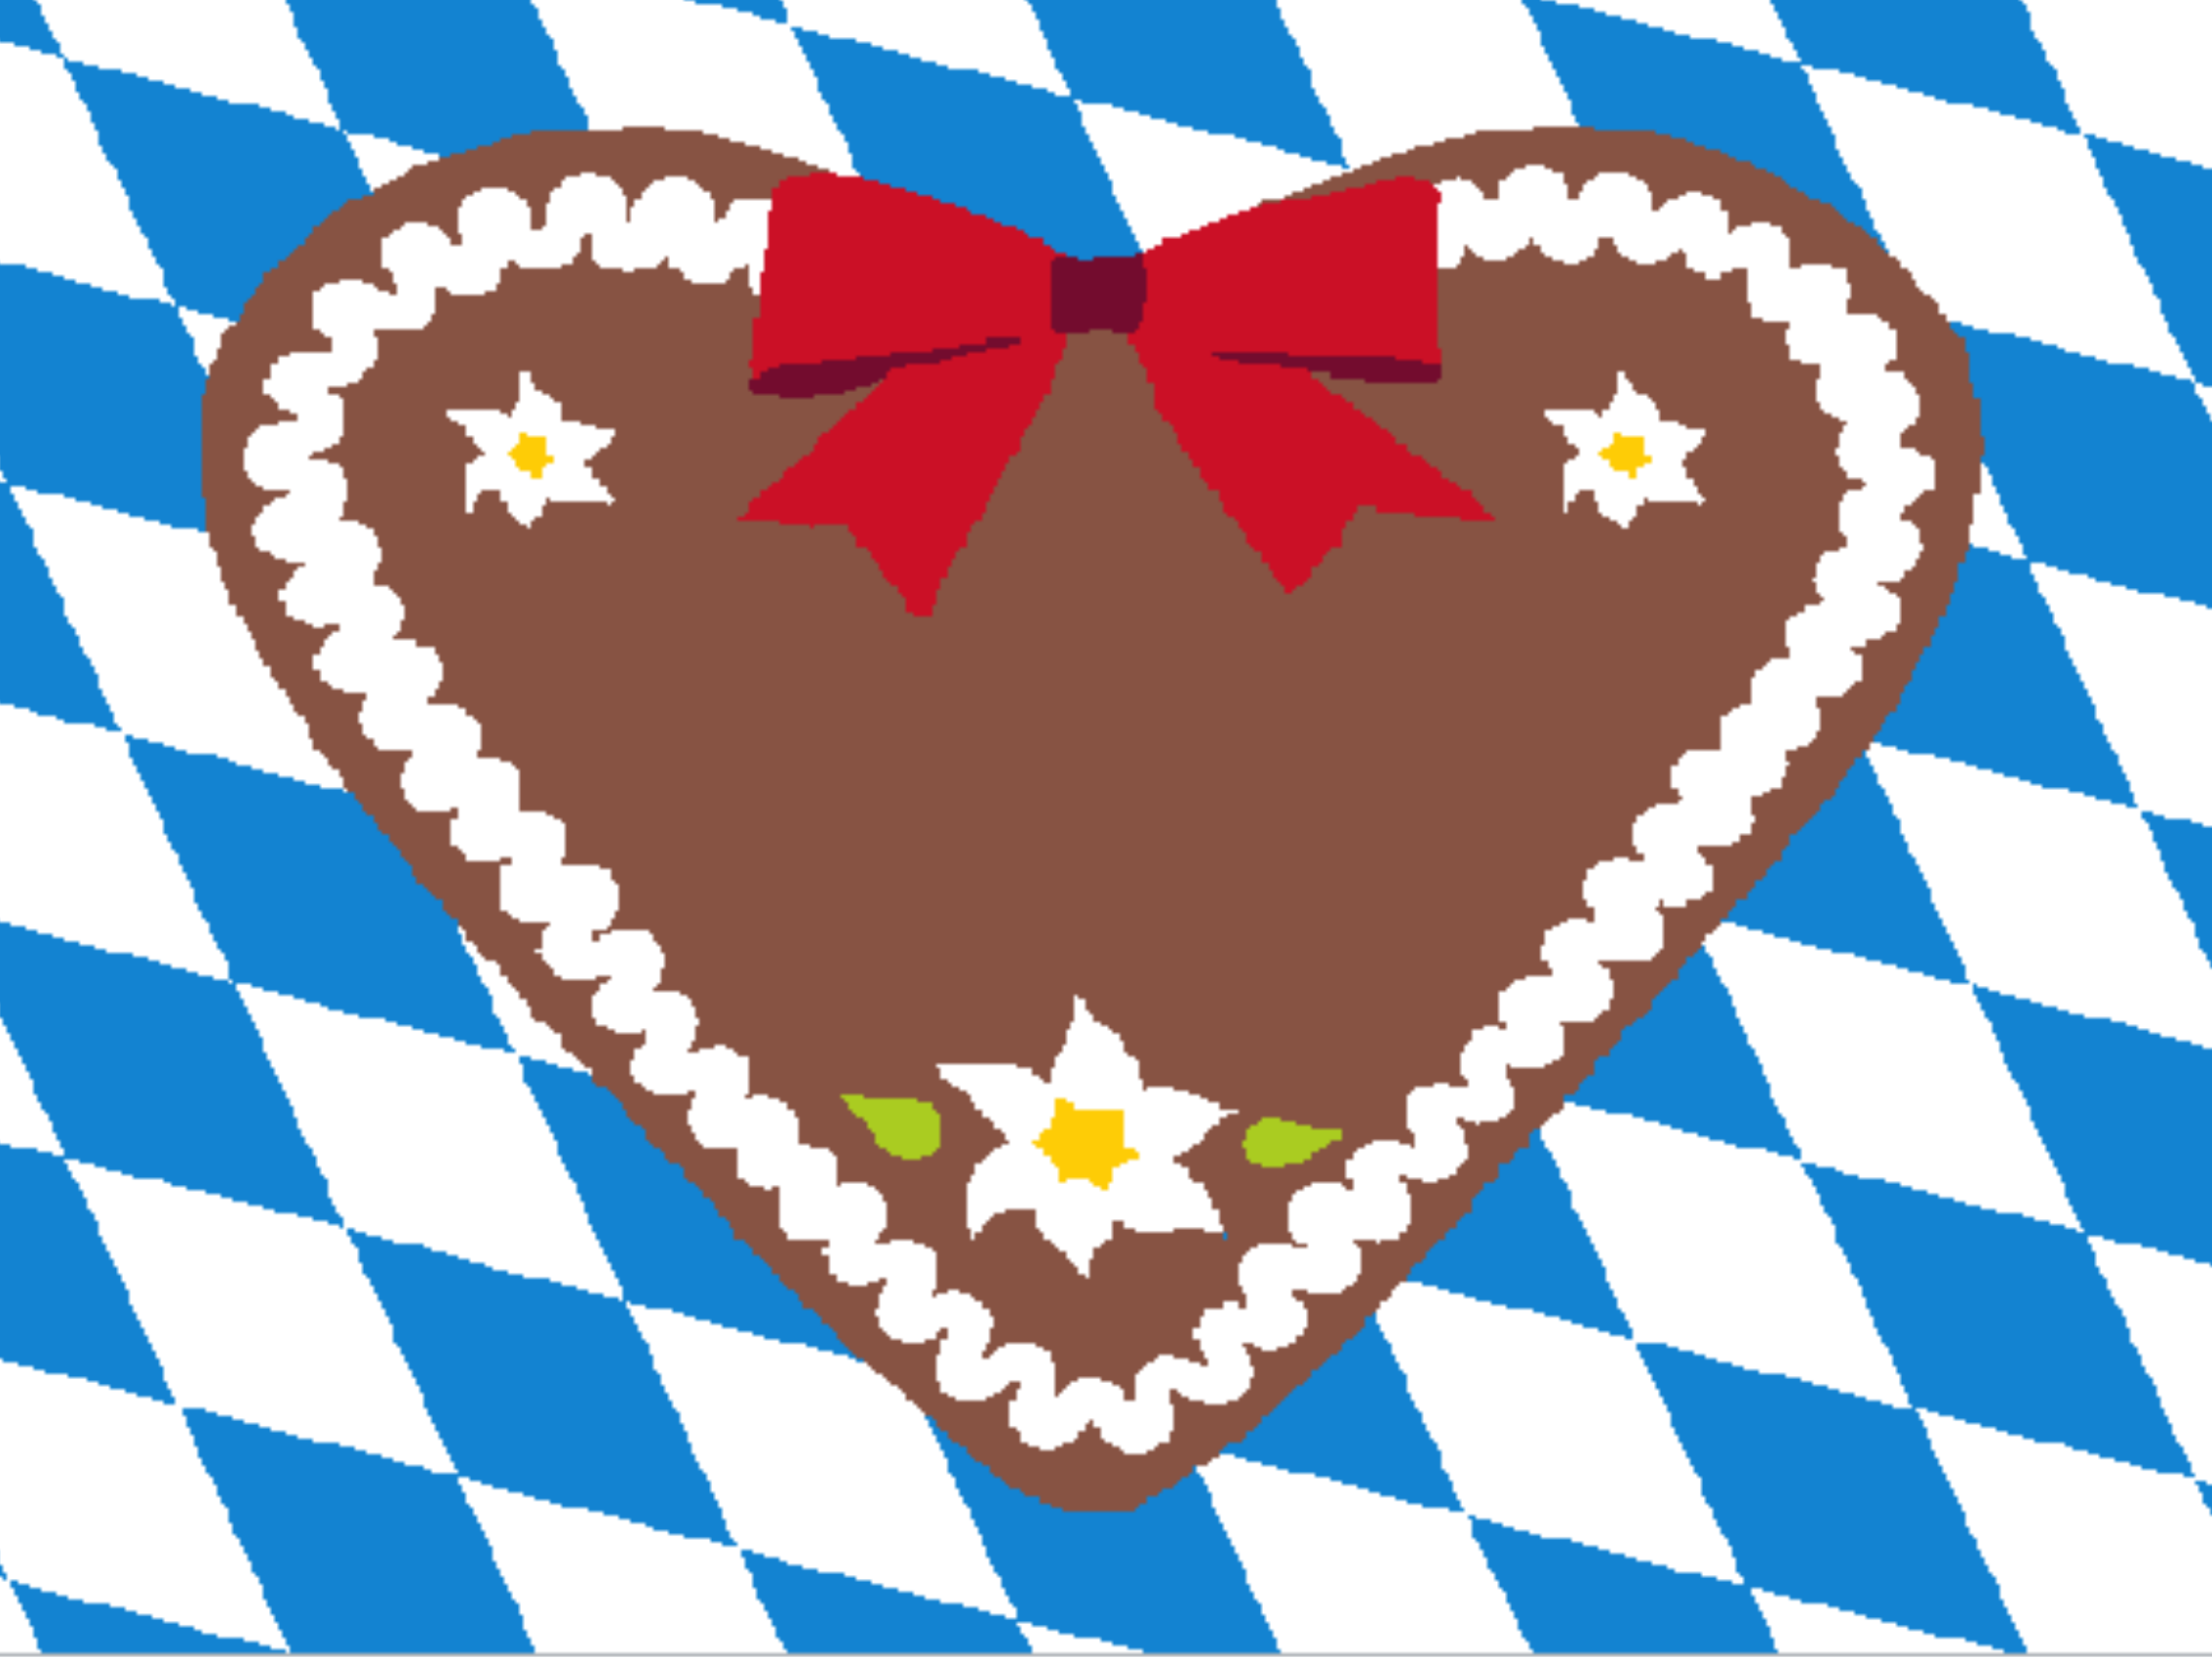 Gingerbread heart 999-1486